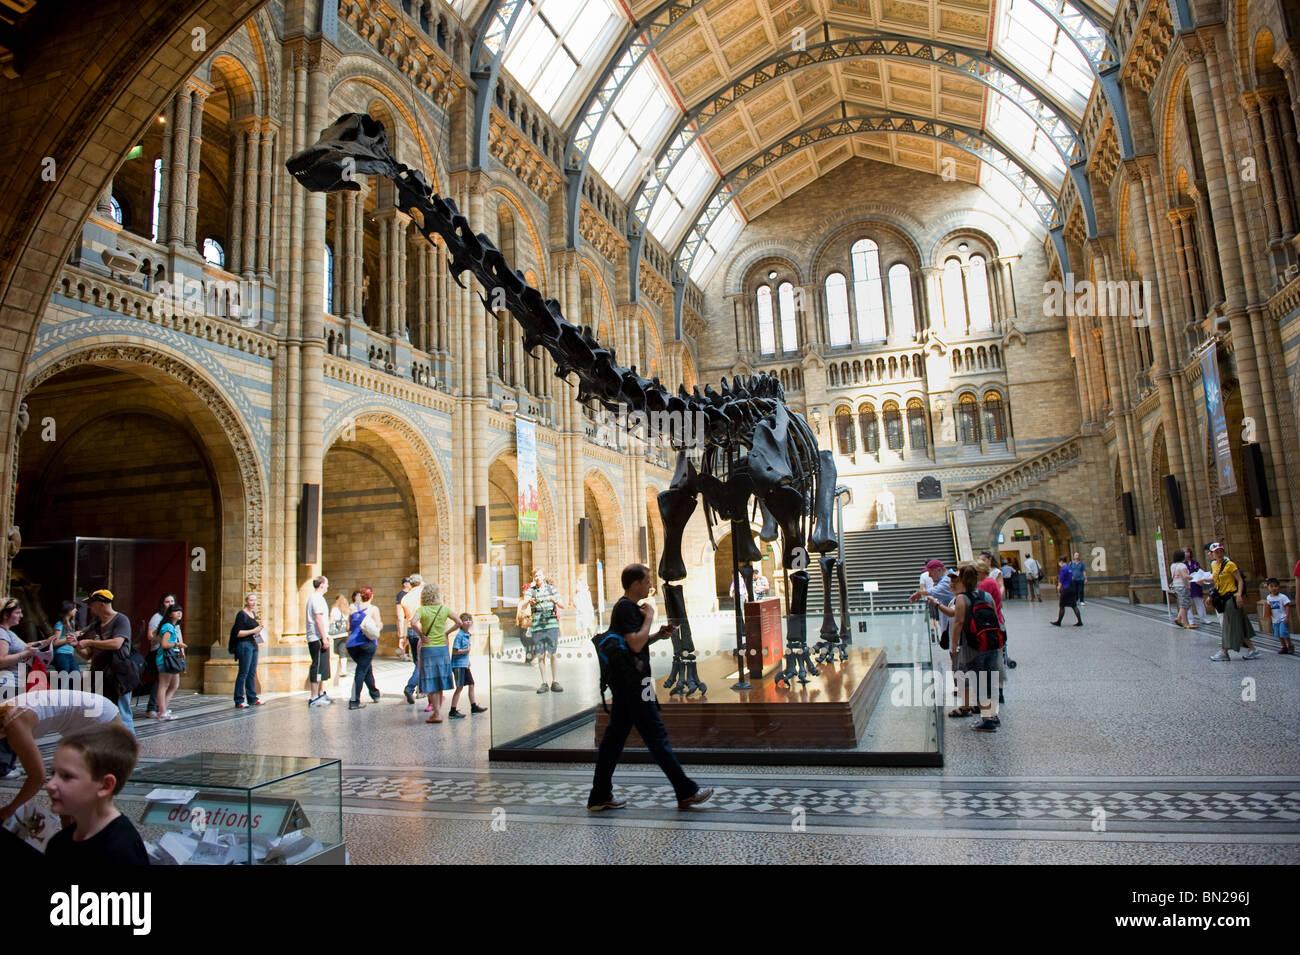 Diplodocus_skeleton_in_the_main_central_